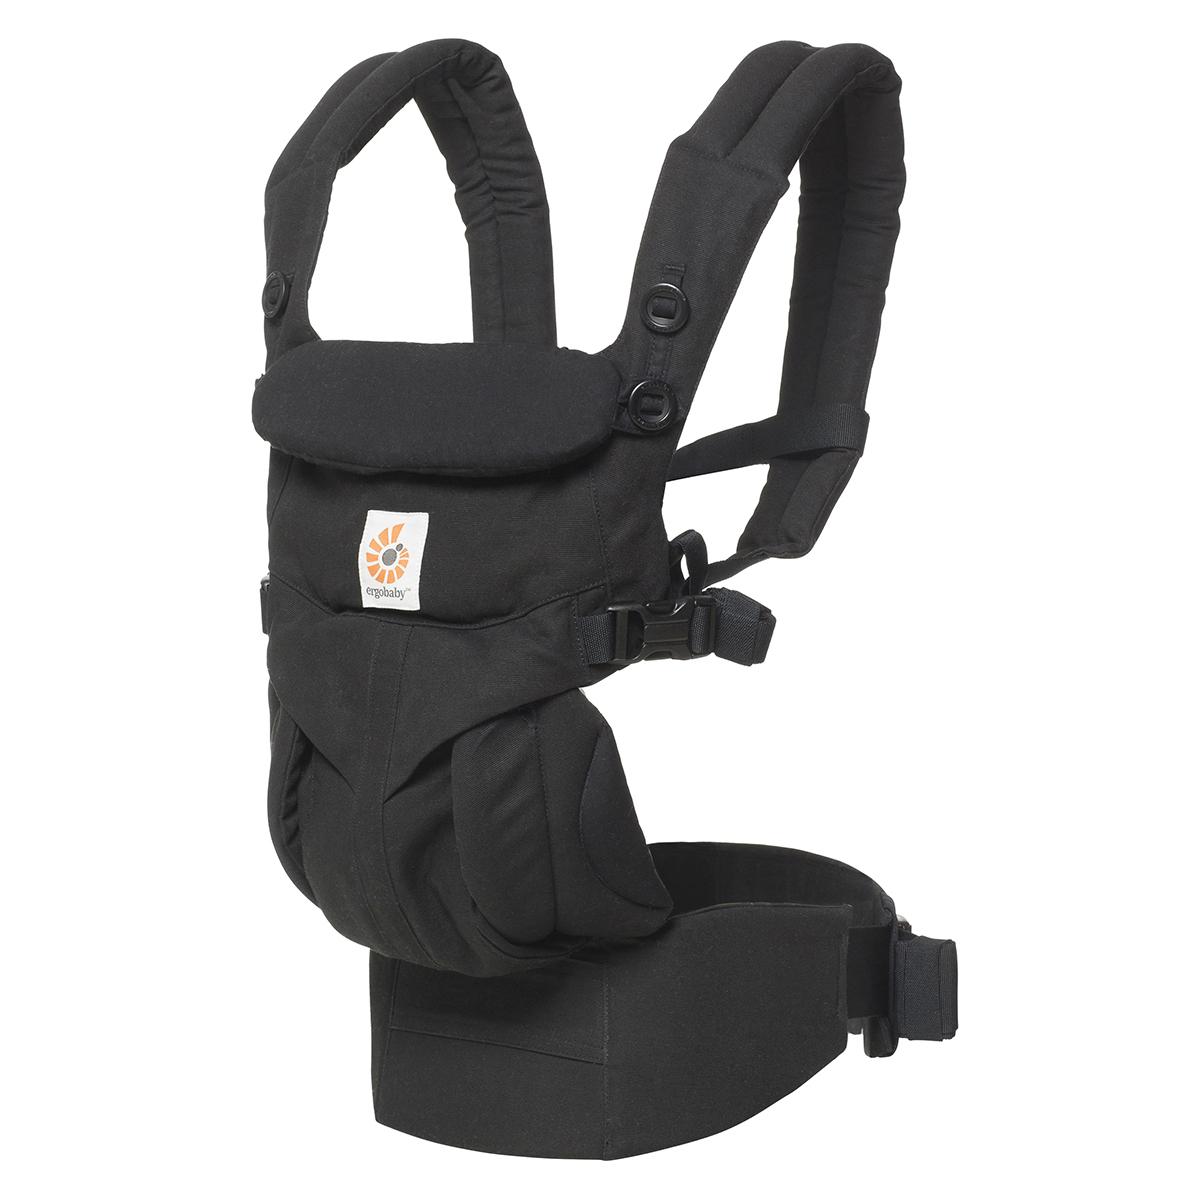 Porte bébé Porte-bébé Omni 360 - Noir Intense Porte-bébé Omni 360 - Noir Intense